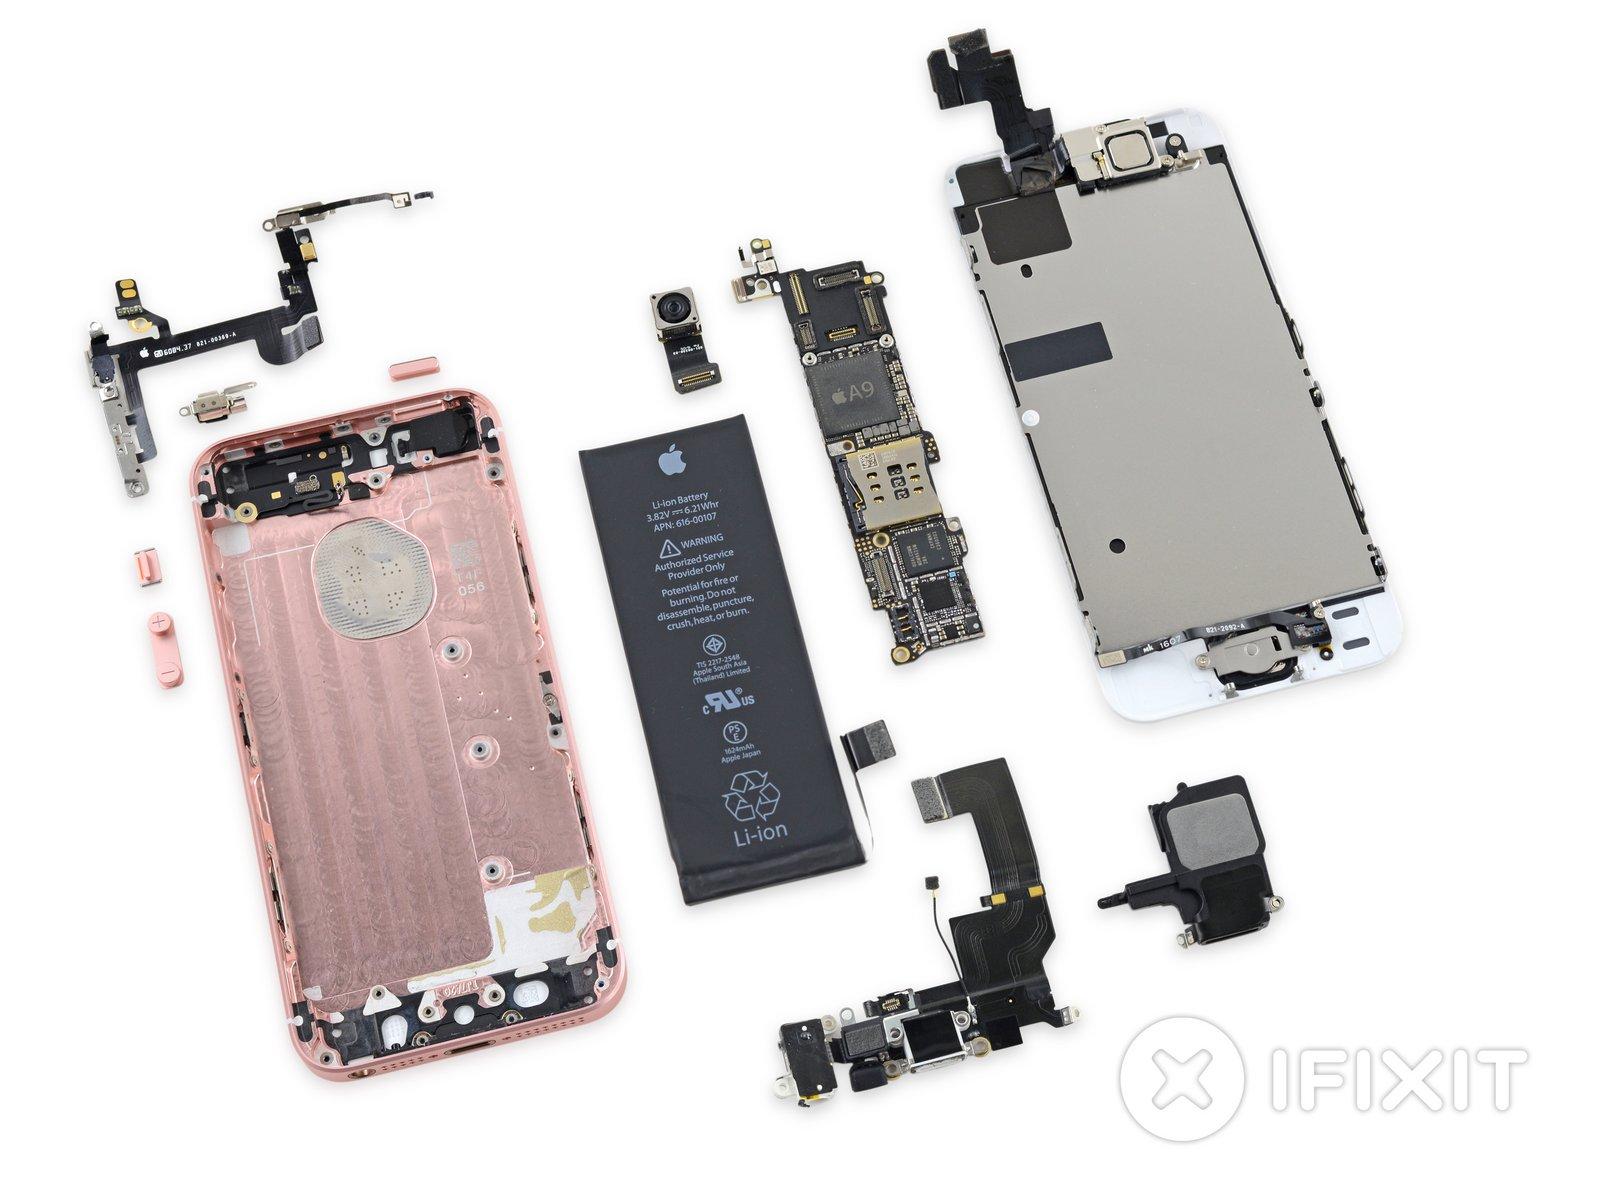 Iphone Se Teardown Ifixit 3 Circuit Diagram